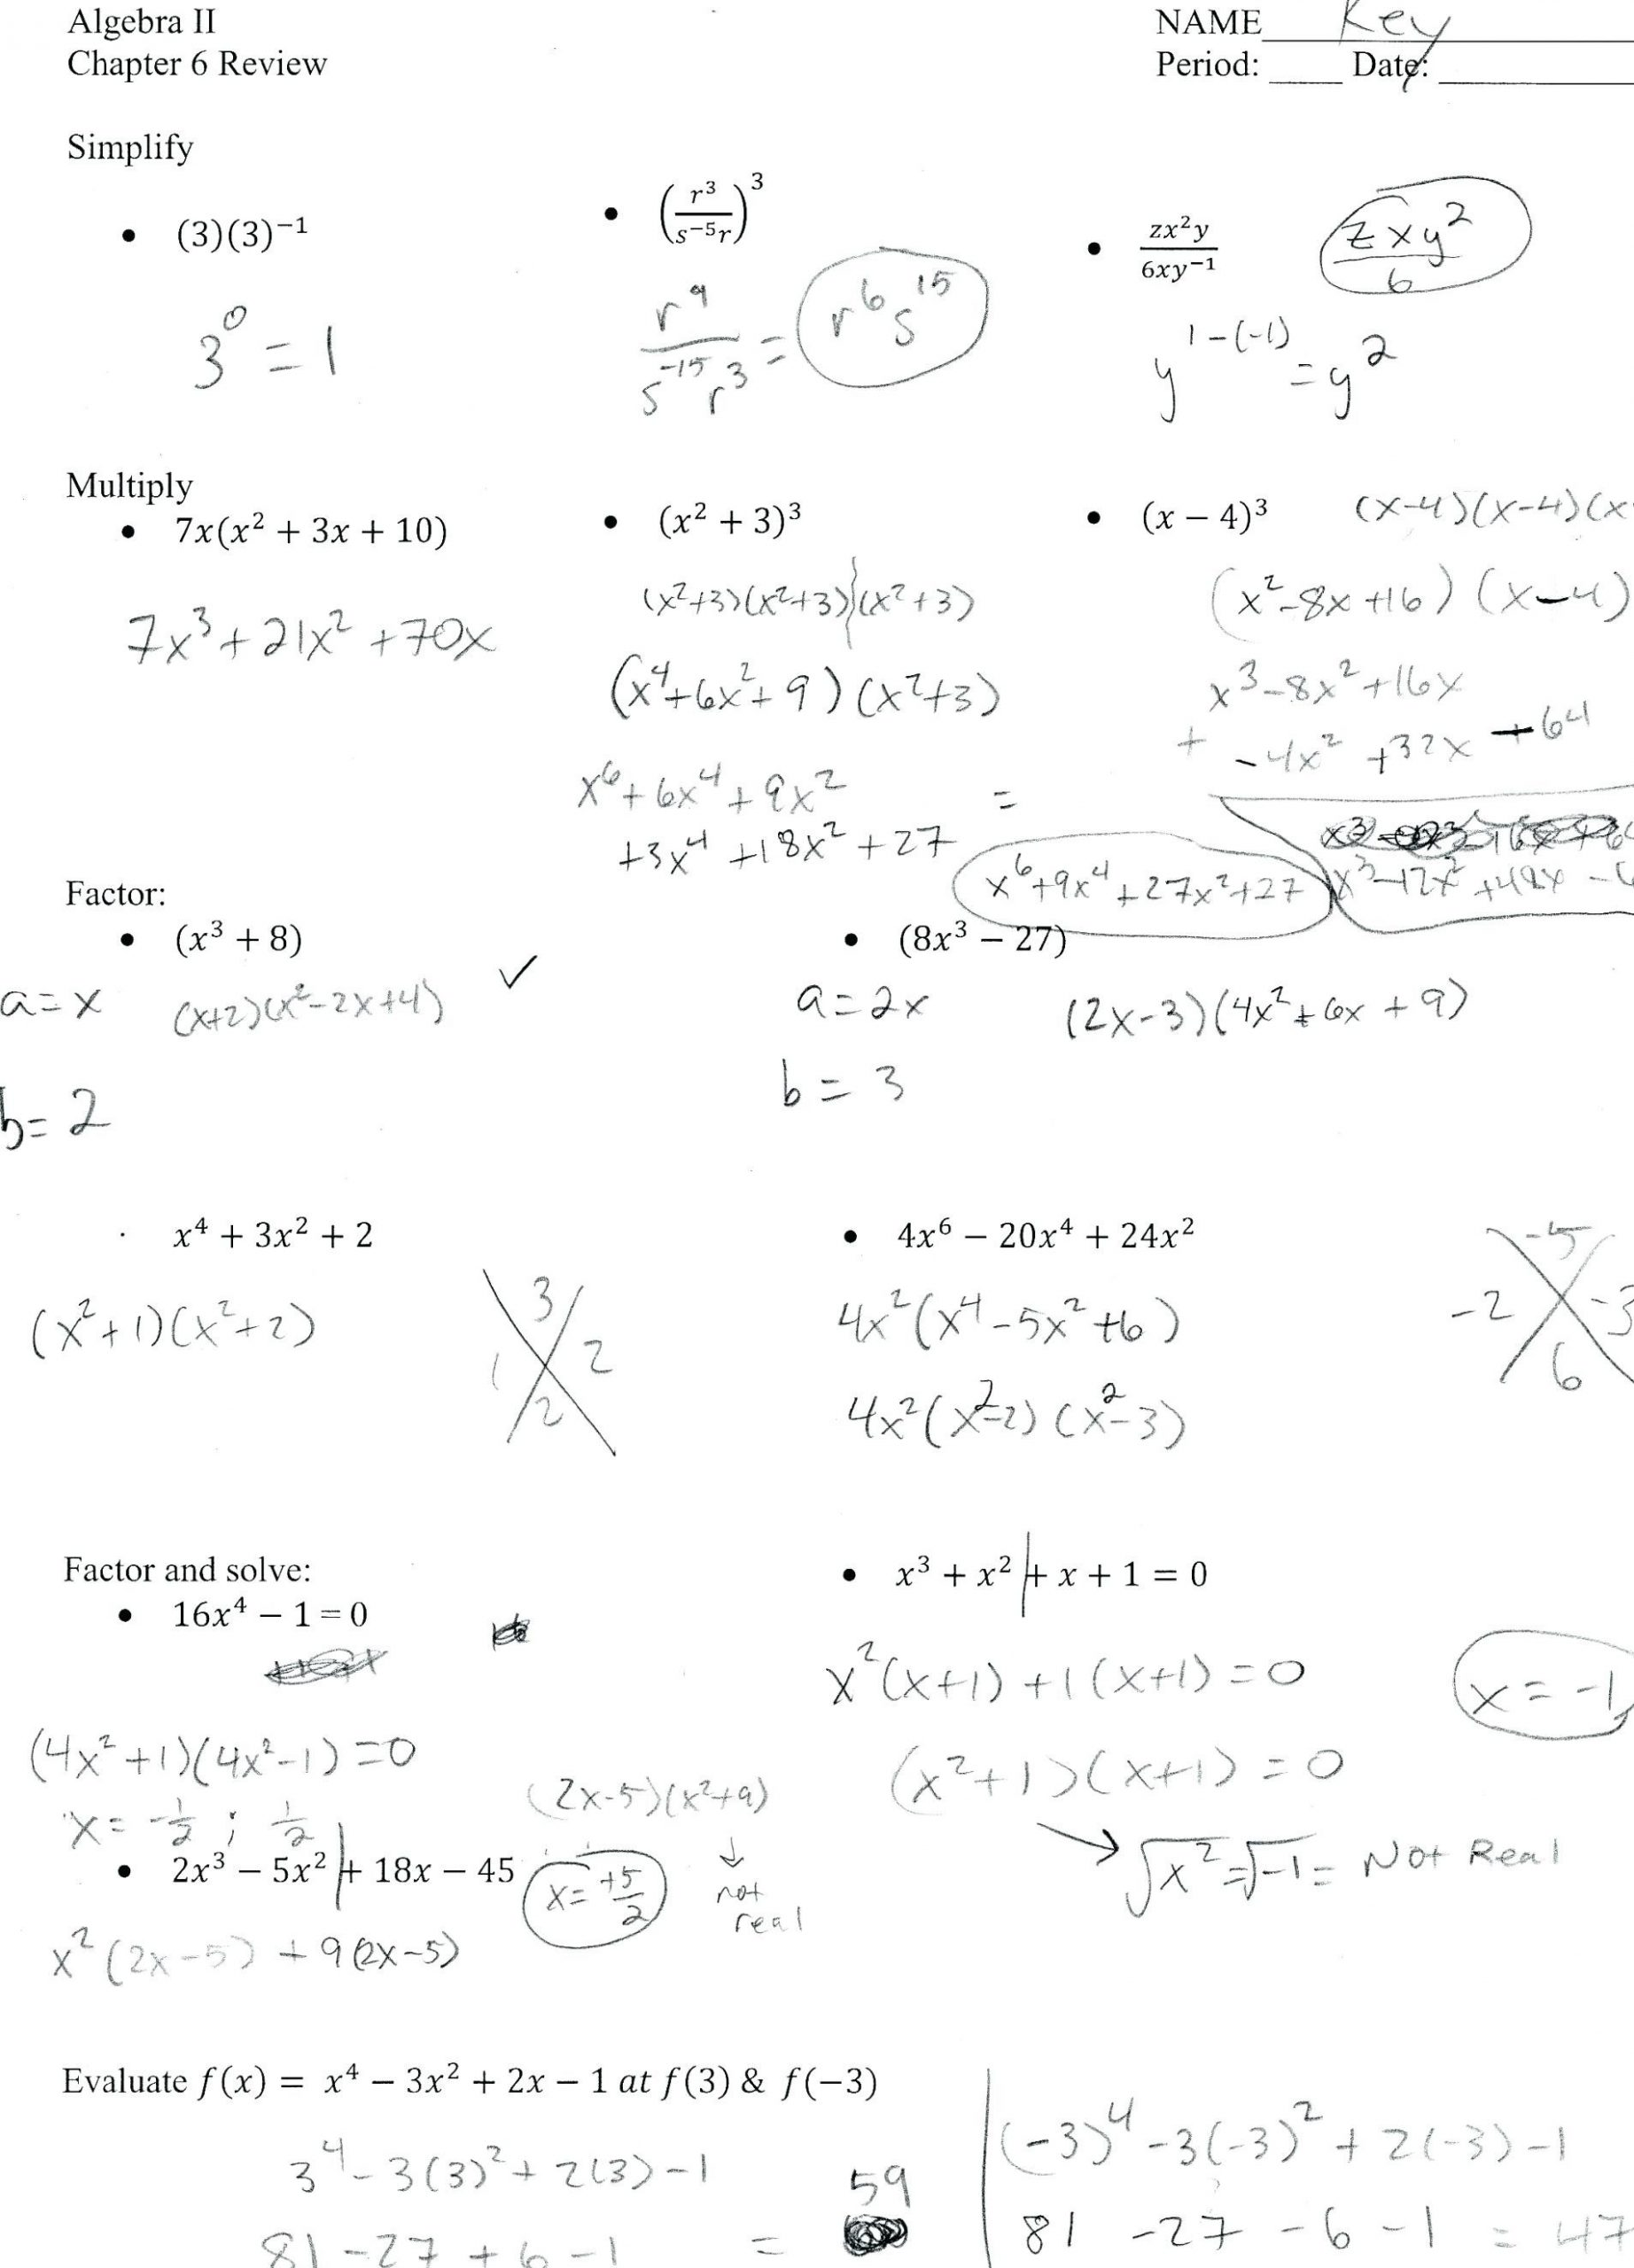 30 Factoring Trinomials Worksheet Algebra 2